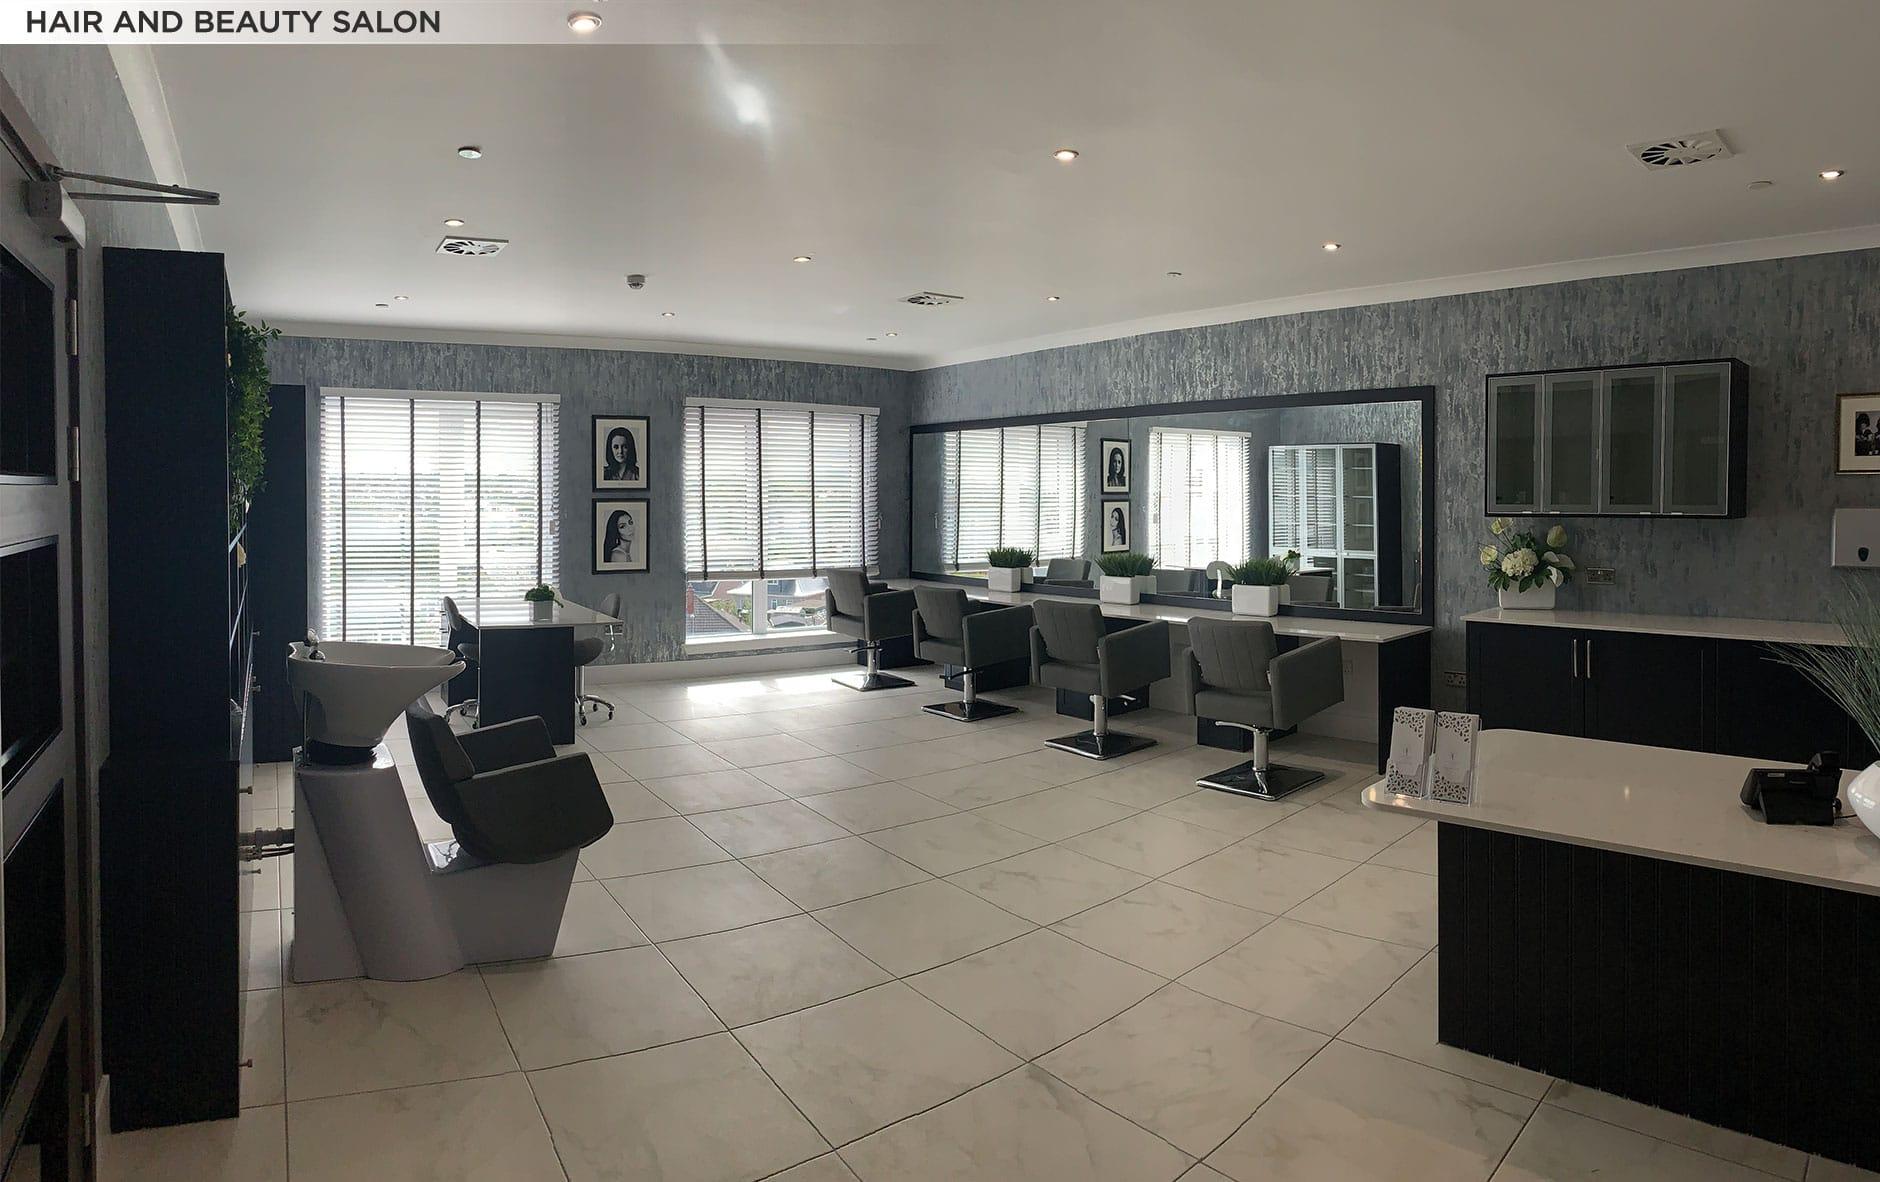 NS-beauty-salon